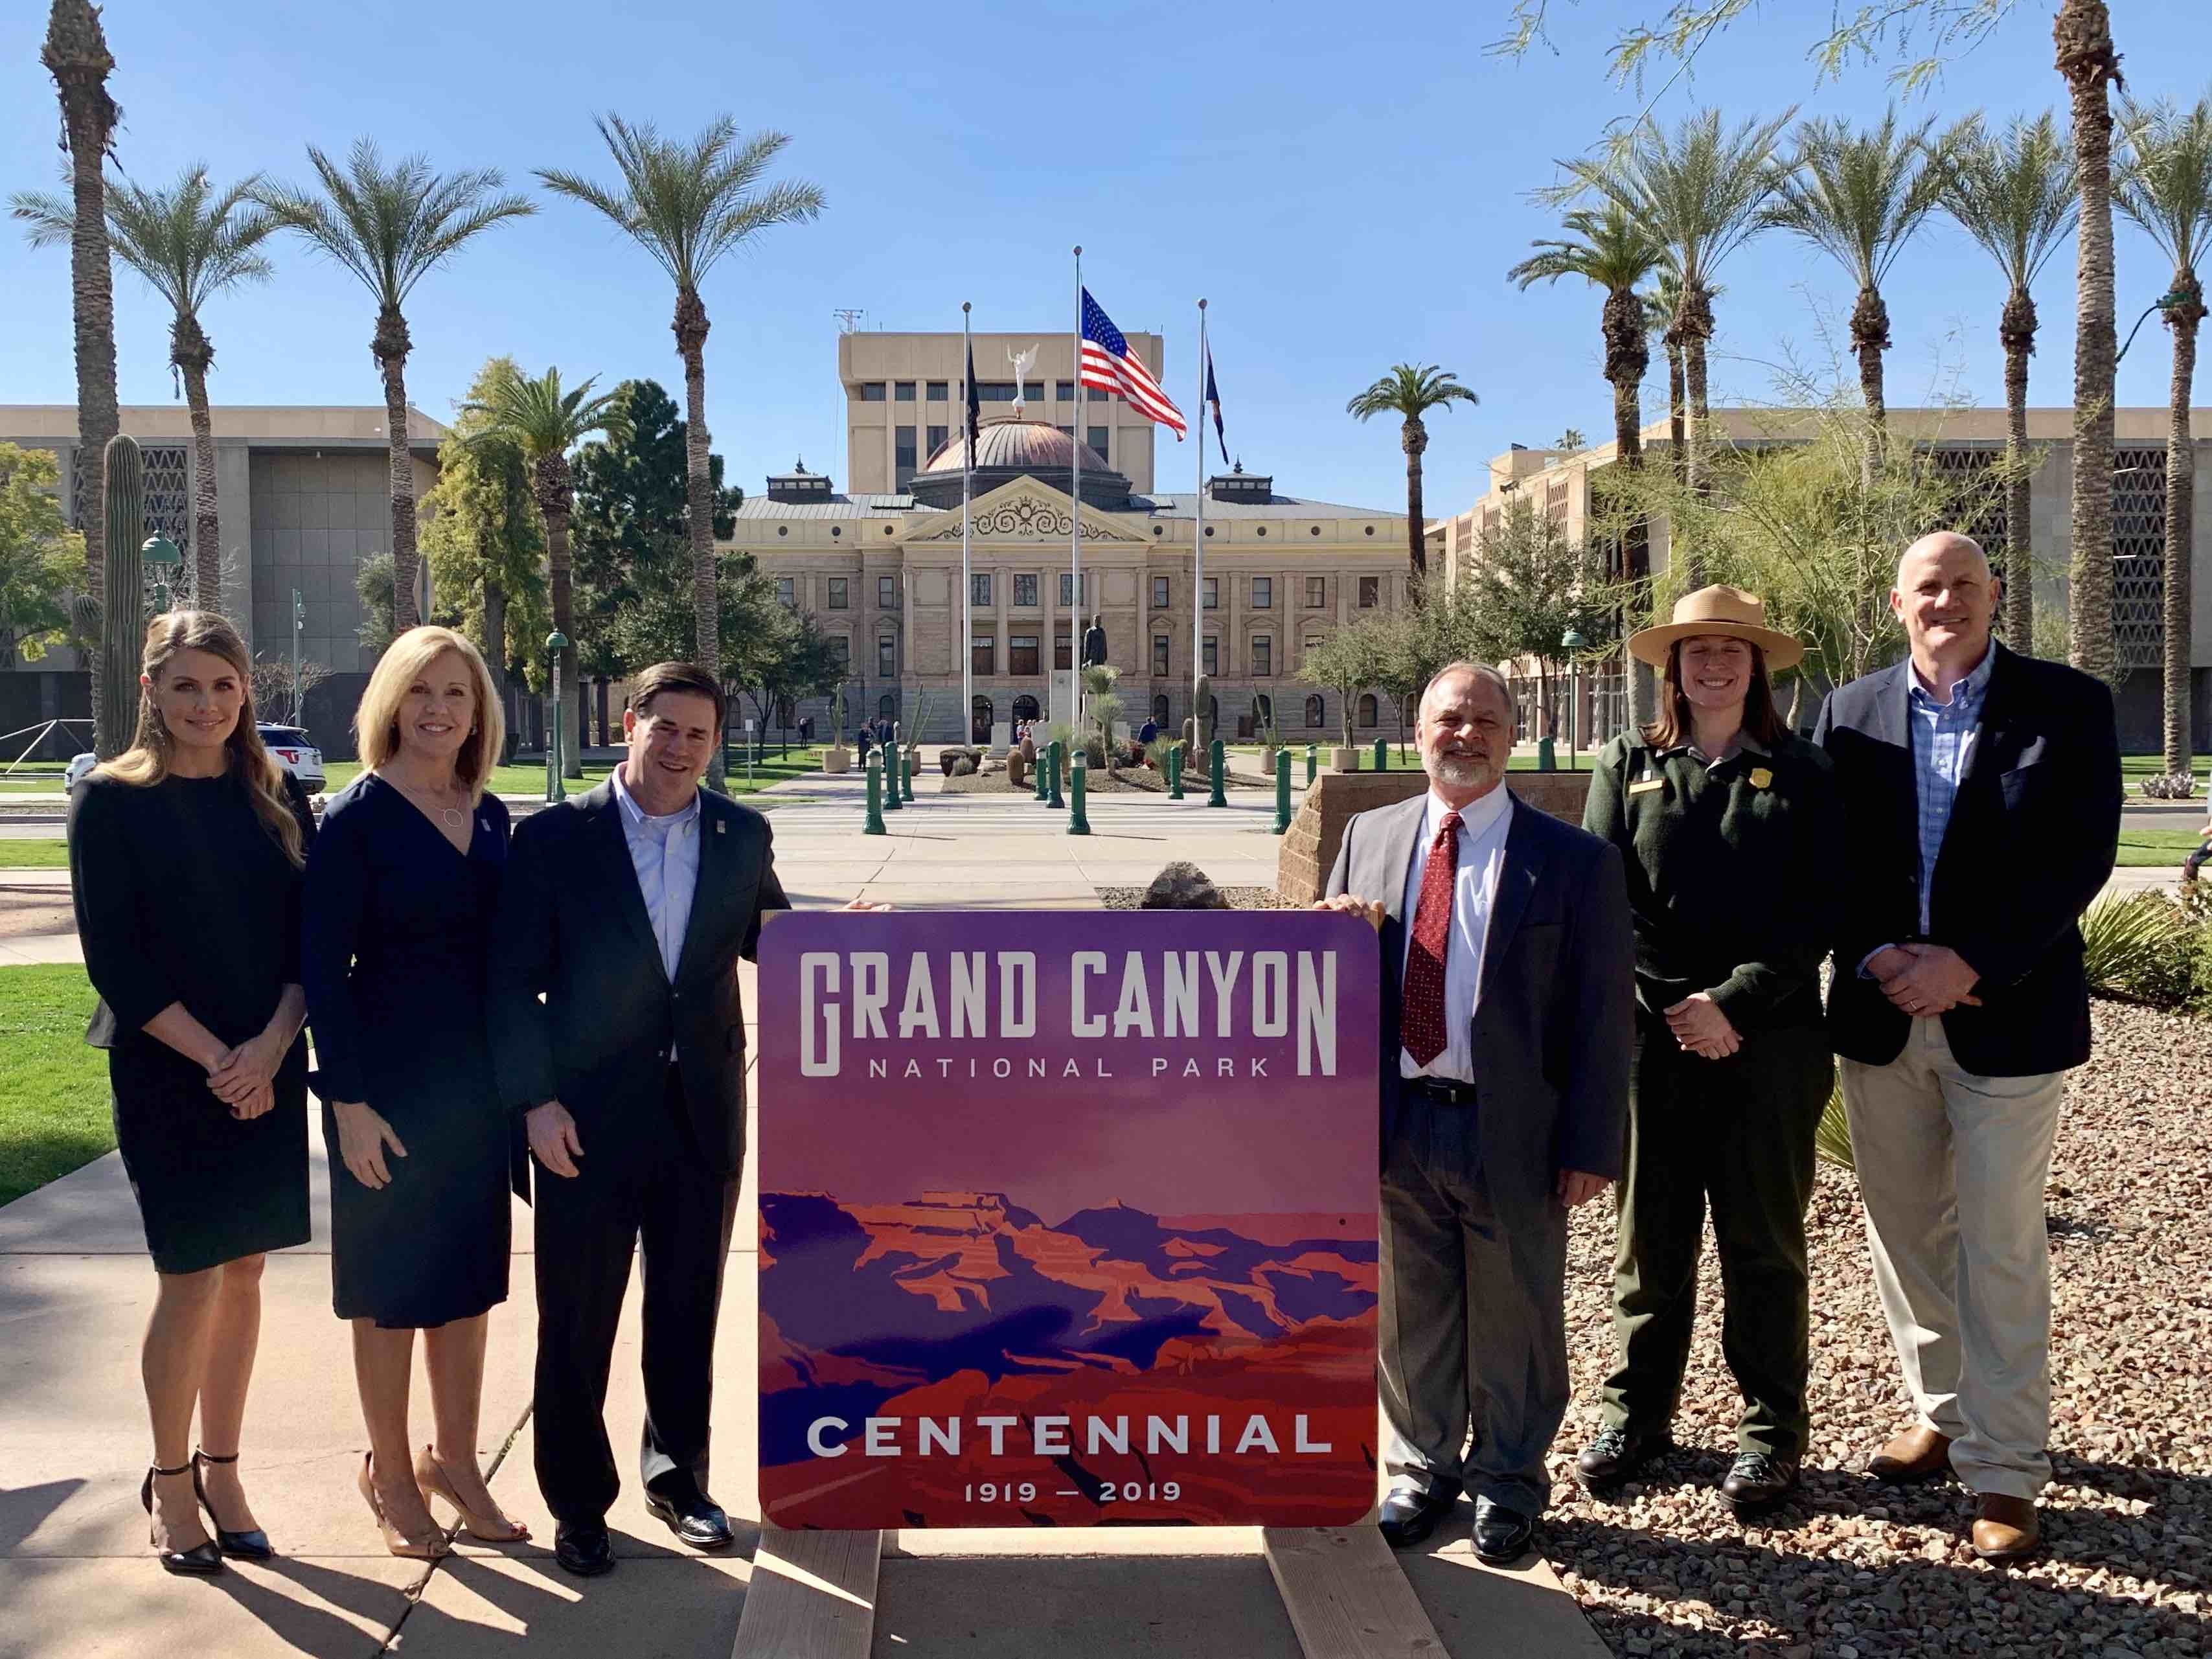 Grand Canyon centennial highway sign